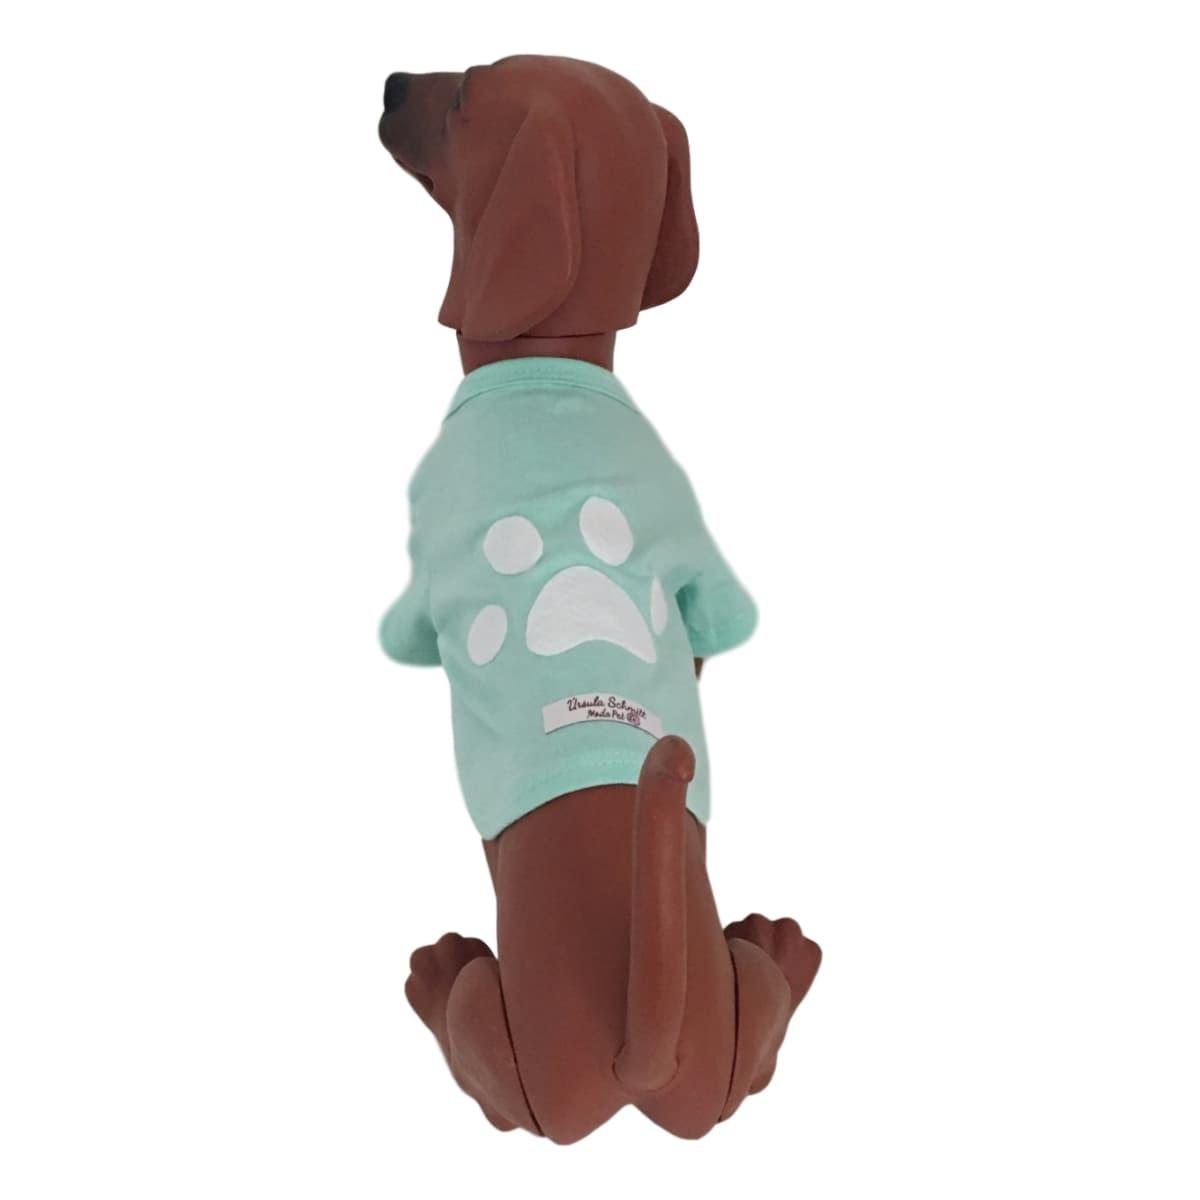 9b198359b7 Úrsula Schmitt Moda Pet - Camiseta Para Cachorro Basic